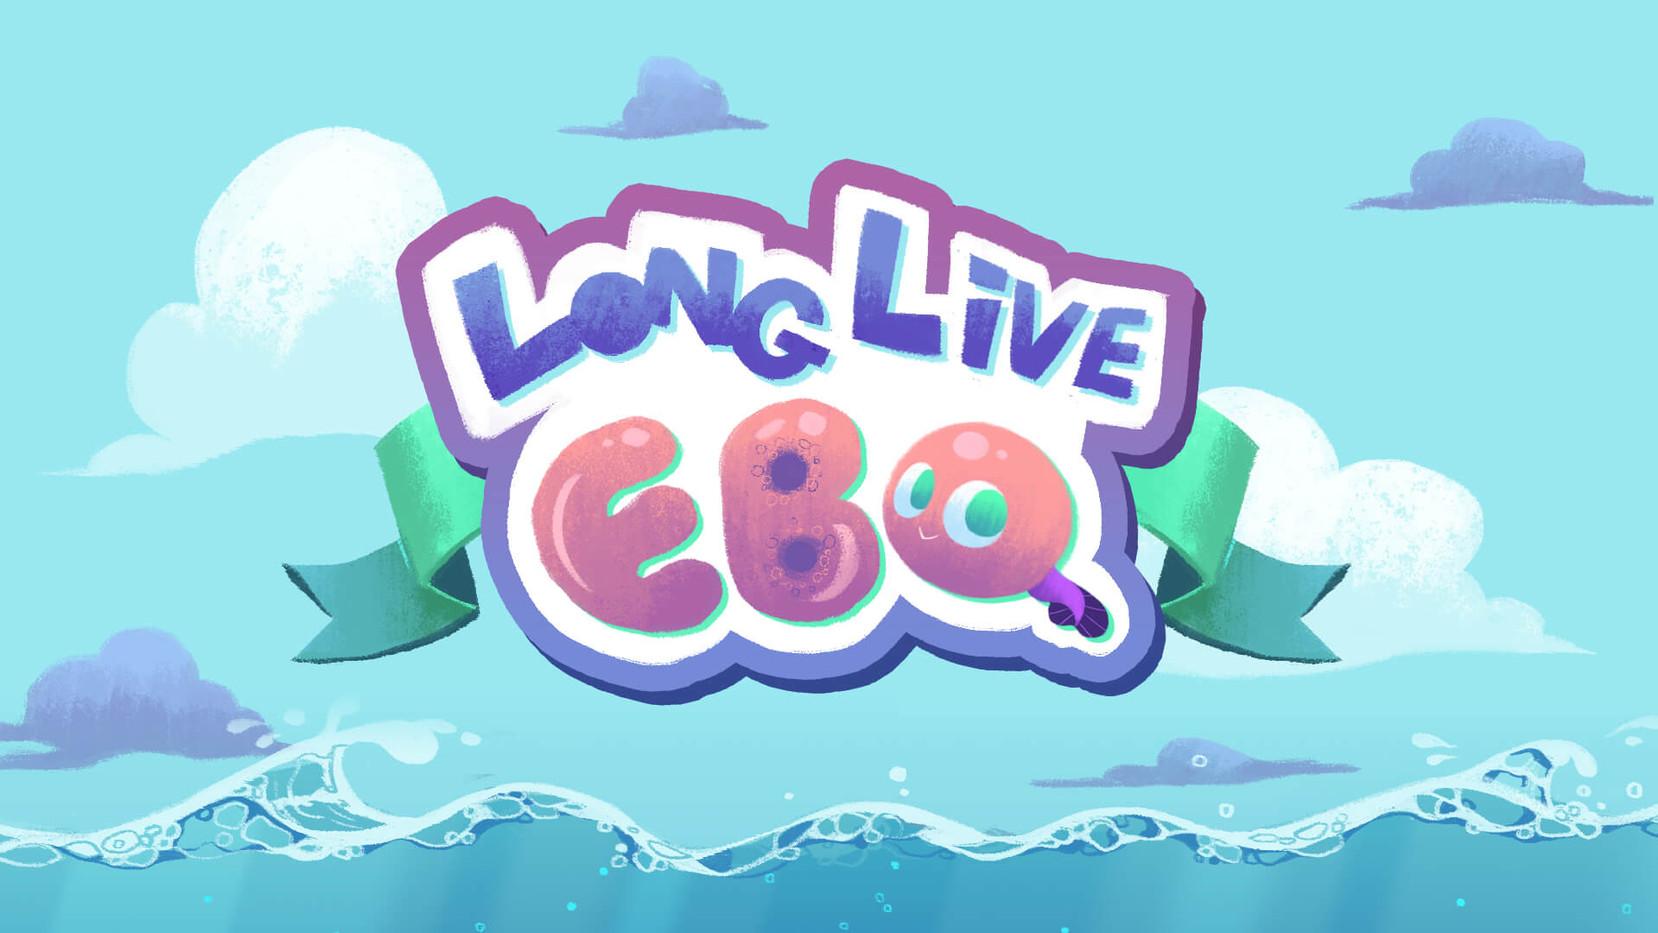 Long Live Ebo title.jpg